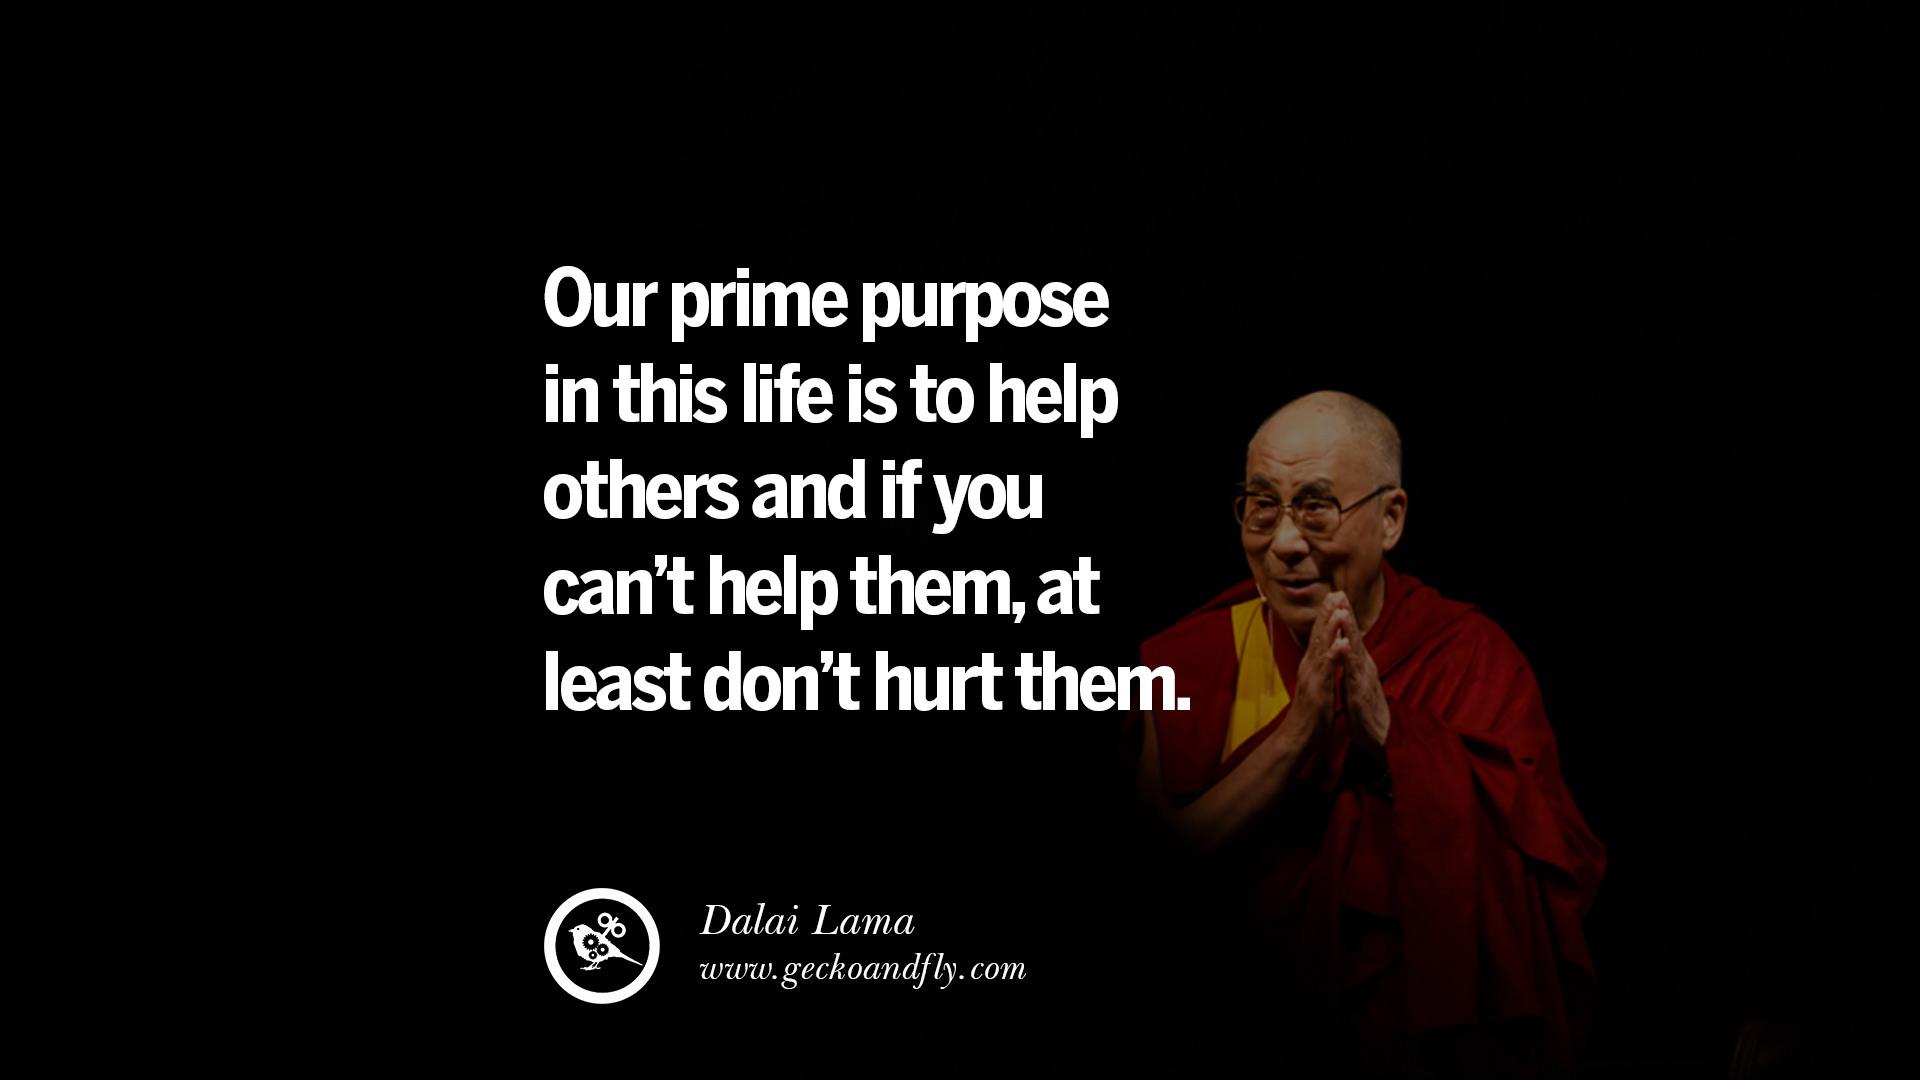 dalai lama quotes love - photo #22